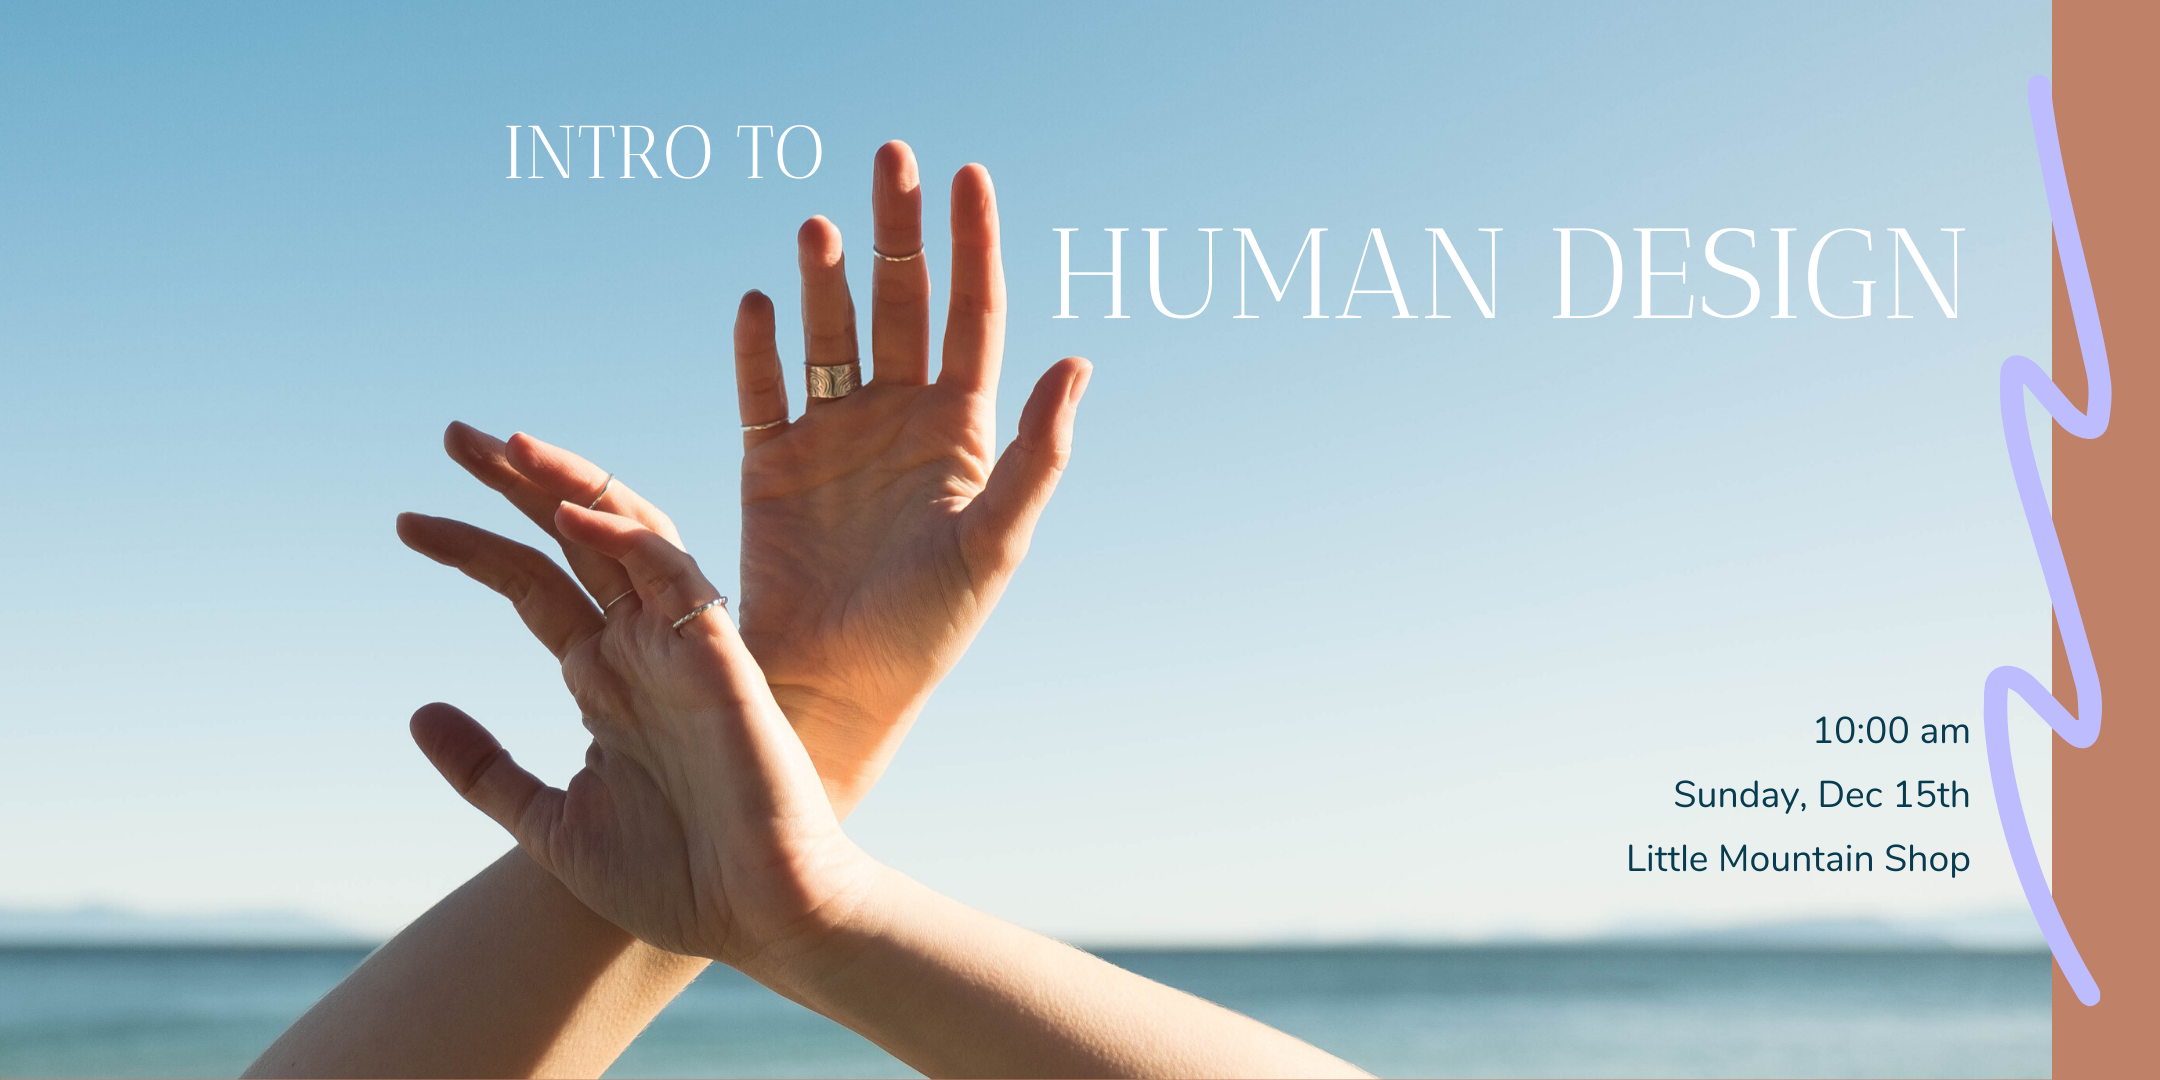 Intro to Human Design